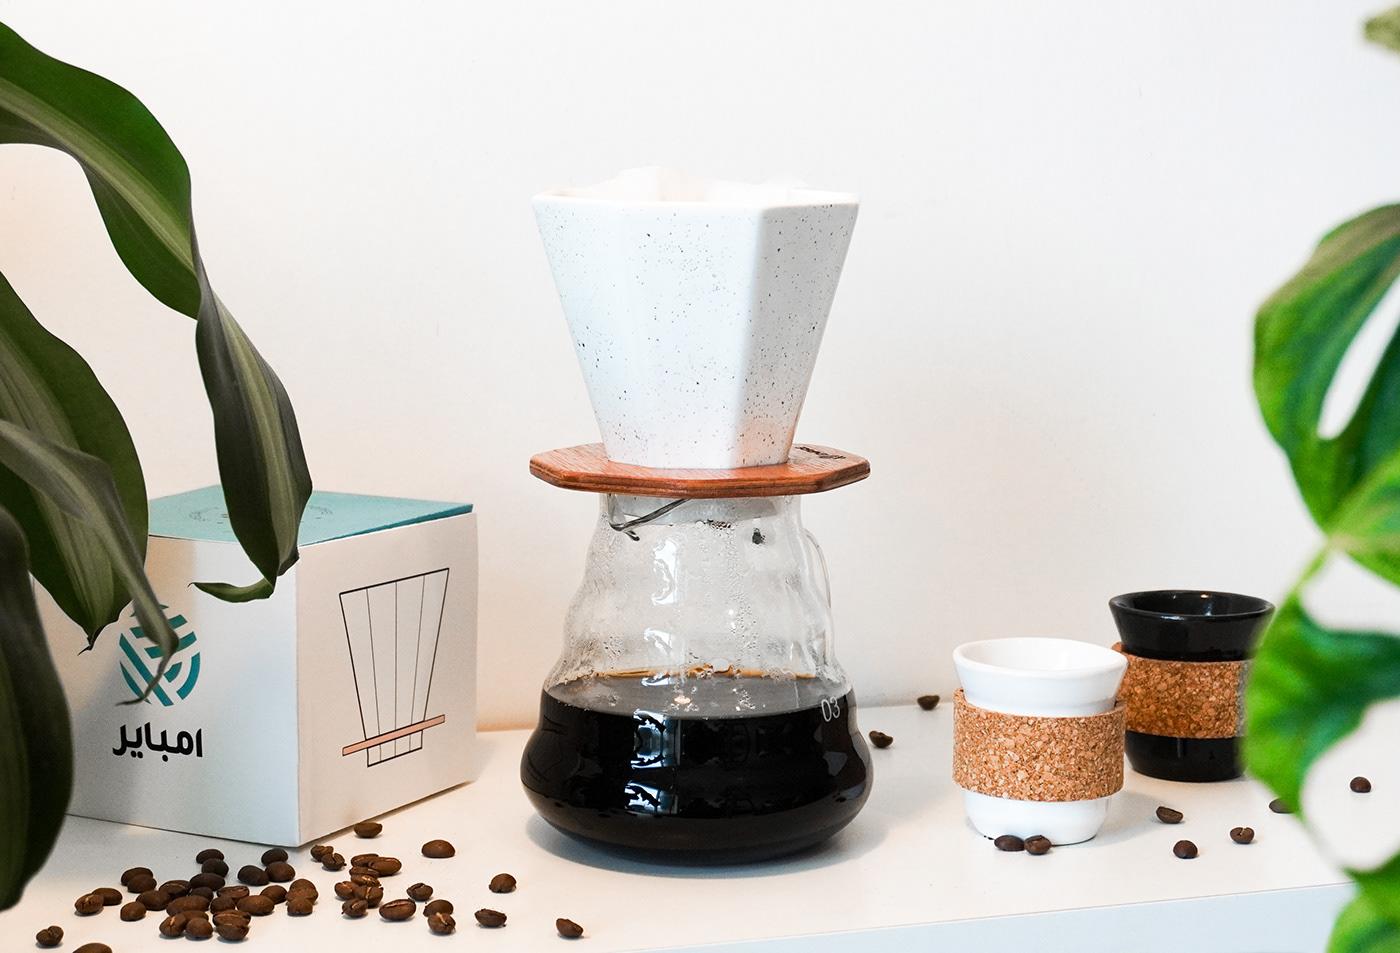 Dripper, coffee, brewing